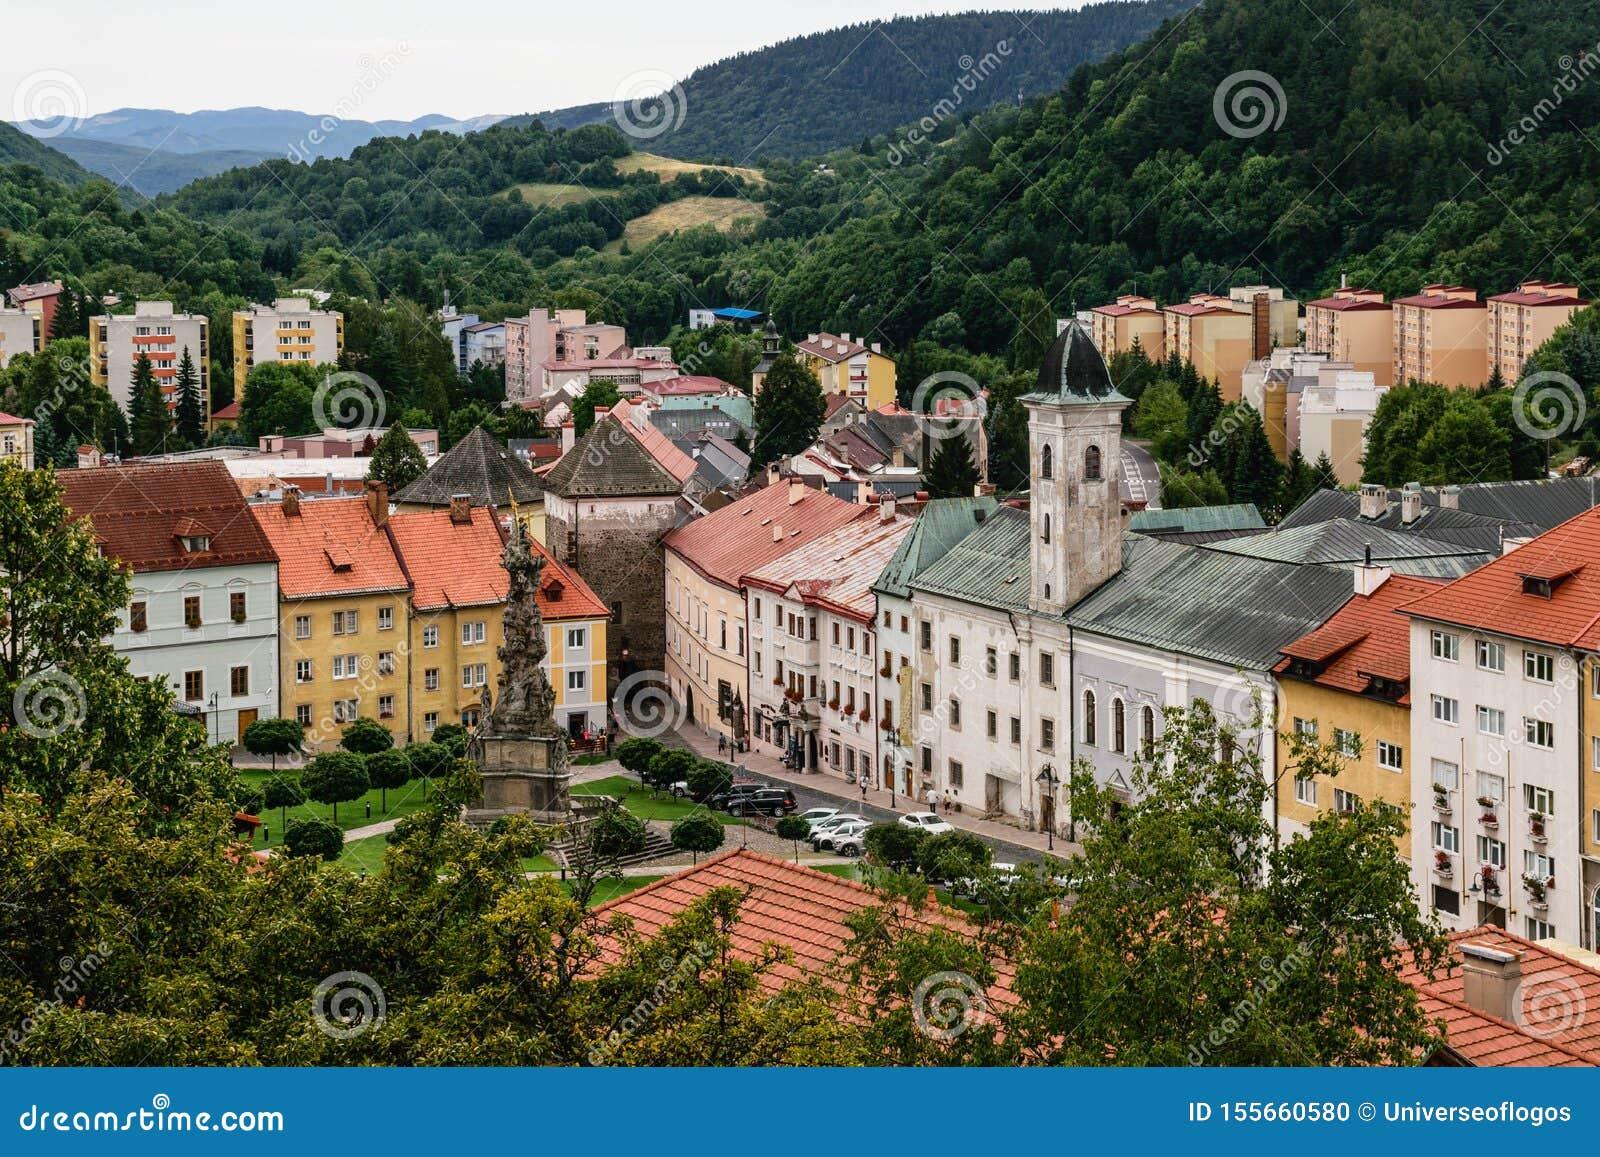 Kremnica city, Slovakia stock photo  Image of activities